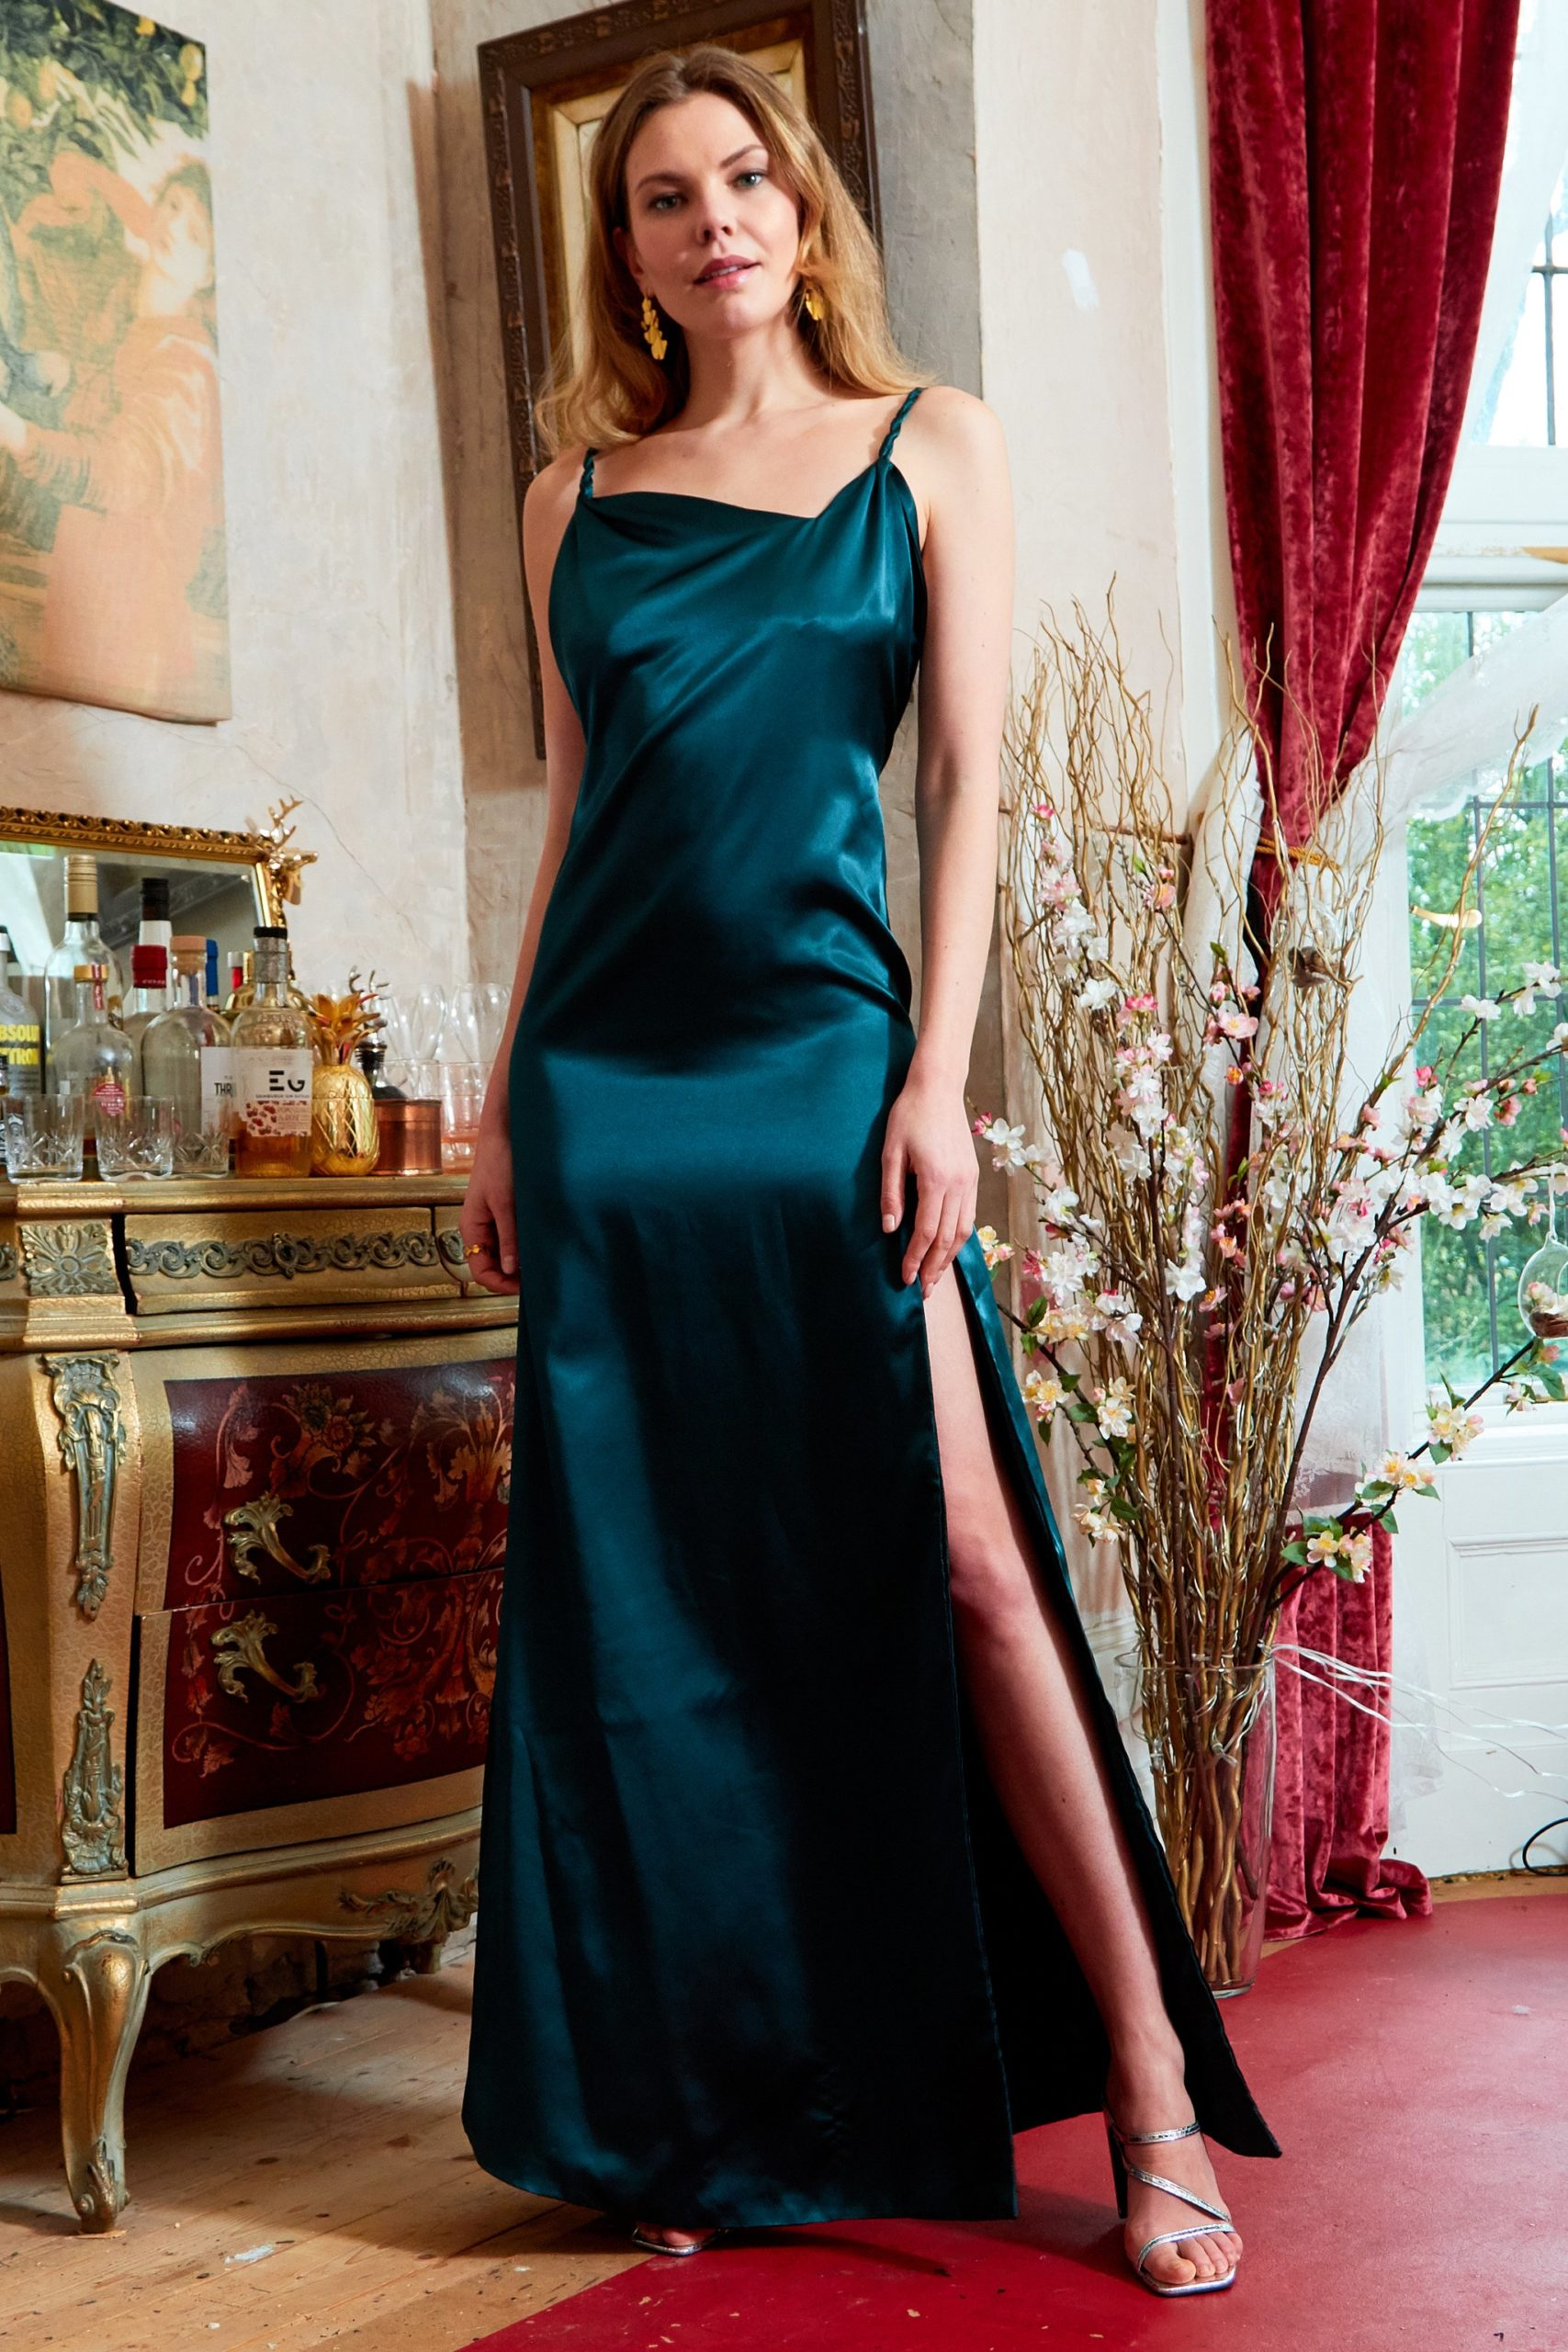 ROSIE - TWISTED STRAPS MAXI SLIP DRESS WITH SIDE SLIT